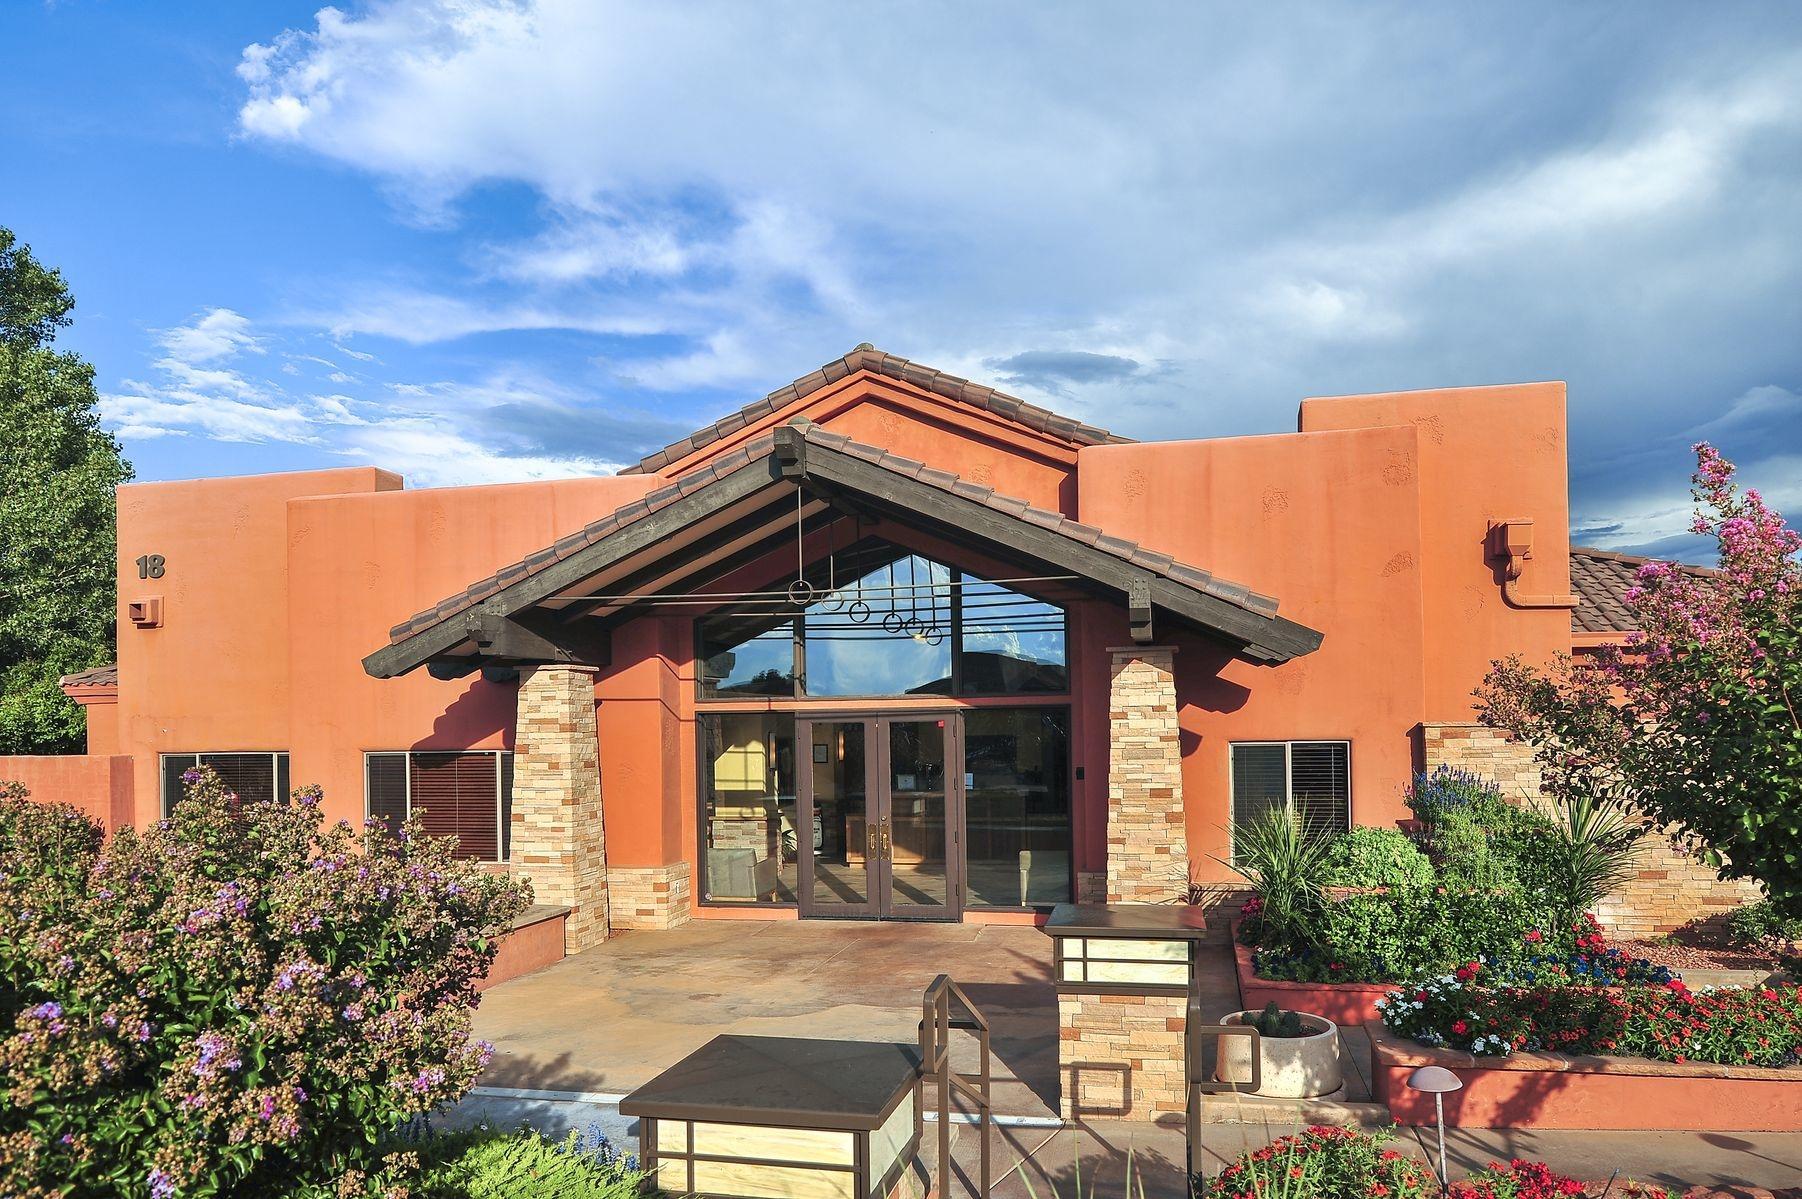 Sedona Summit Resort in Sedona, Arizona